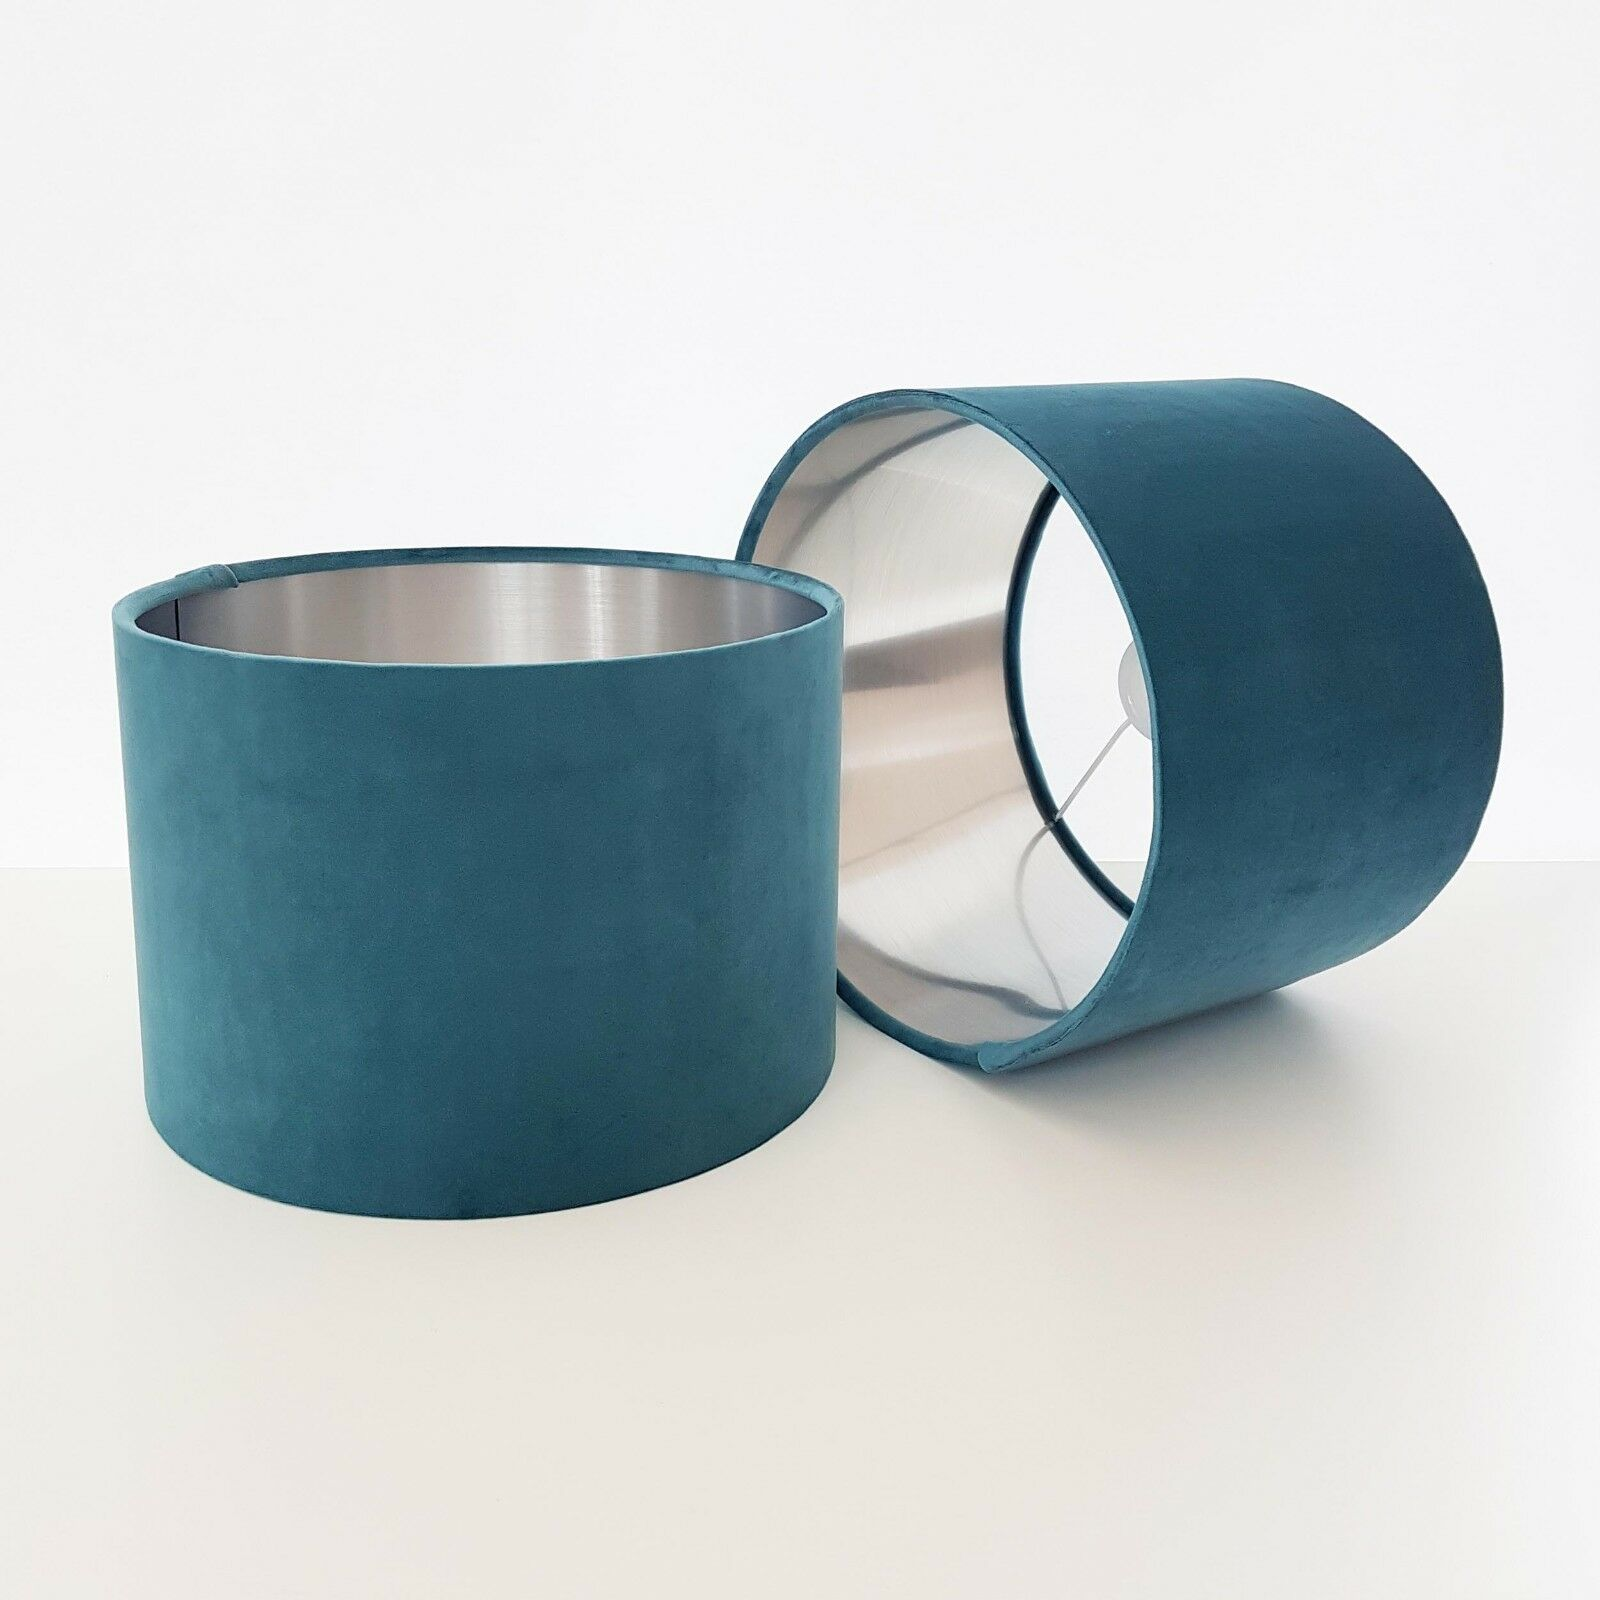 Lampshade Teal Velvet Brushed Silber Lightshade Metallic Blau Grün